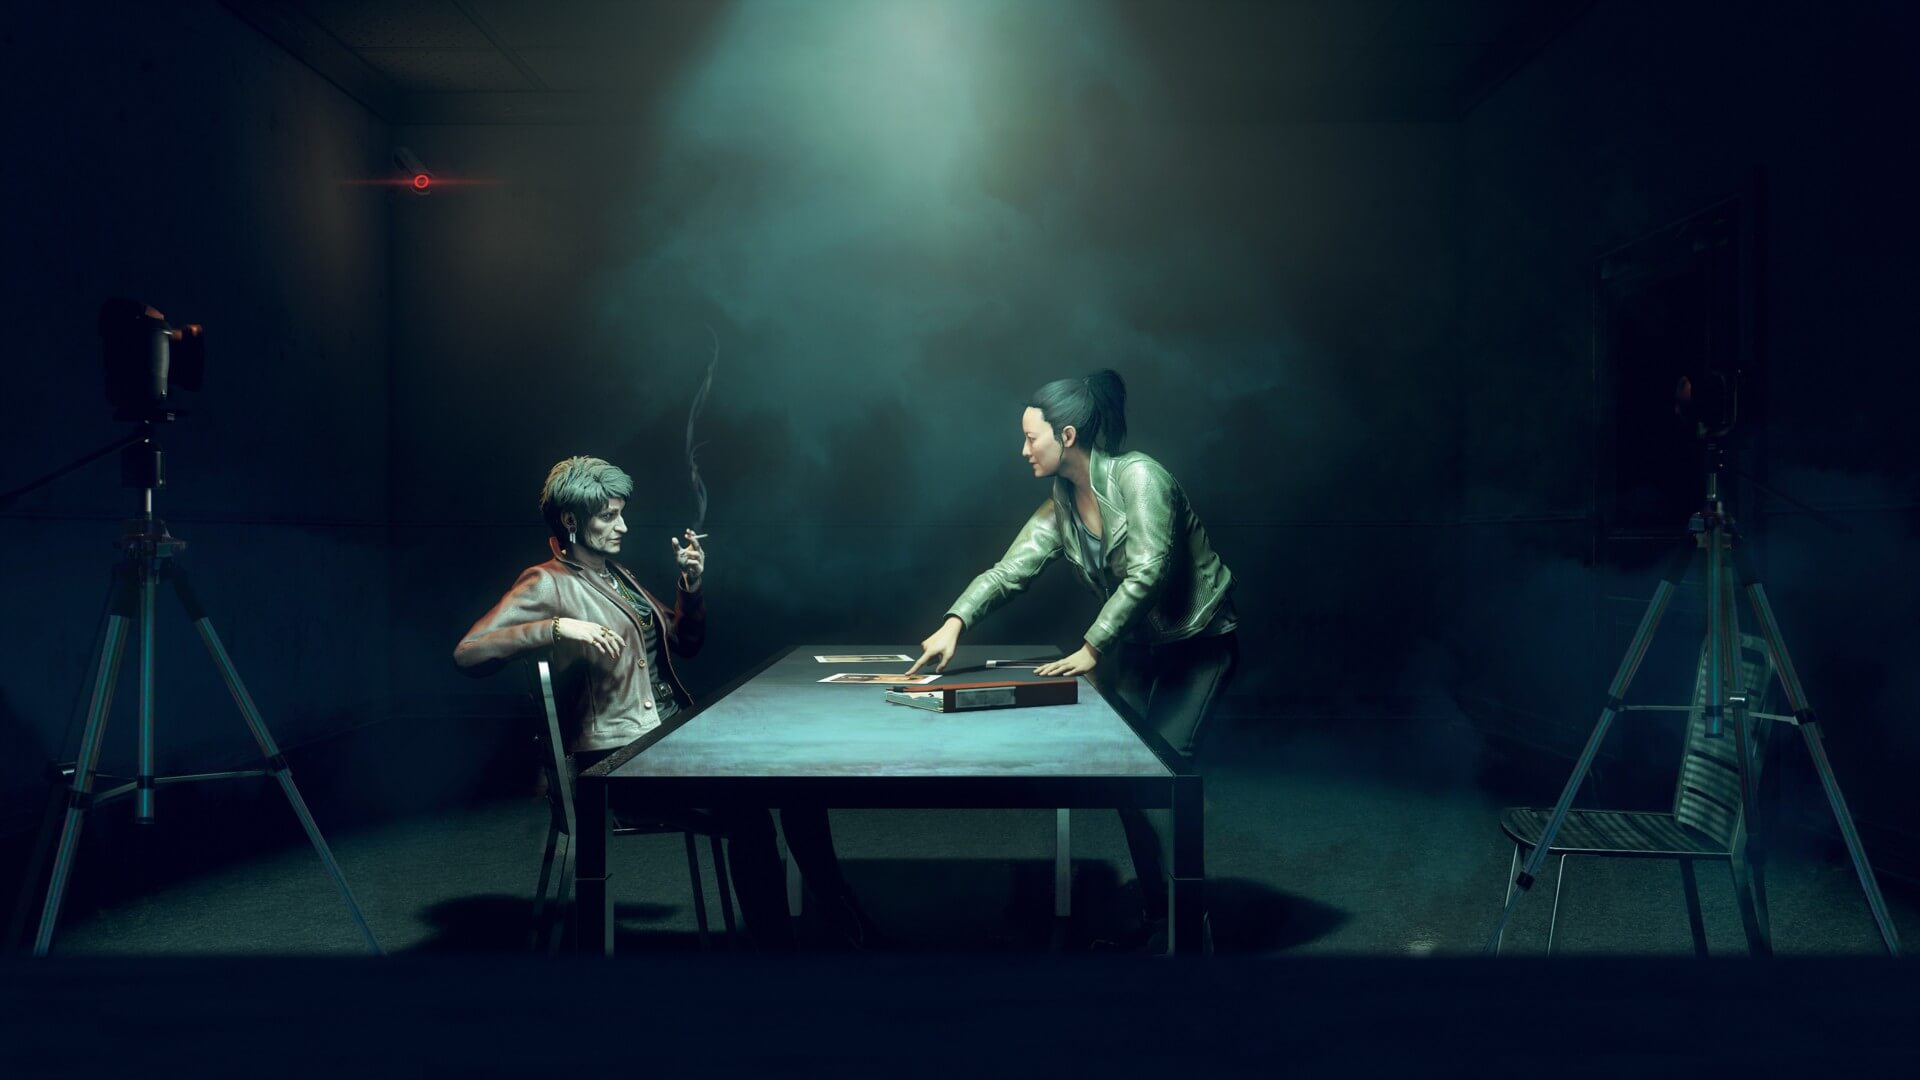 Wdl Screen Mary Interrogation 061020 6pmcest